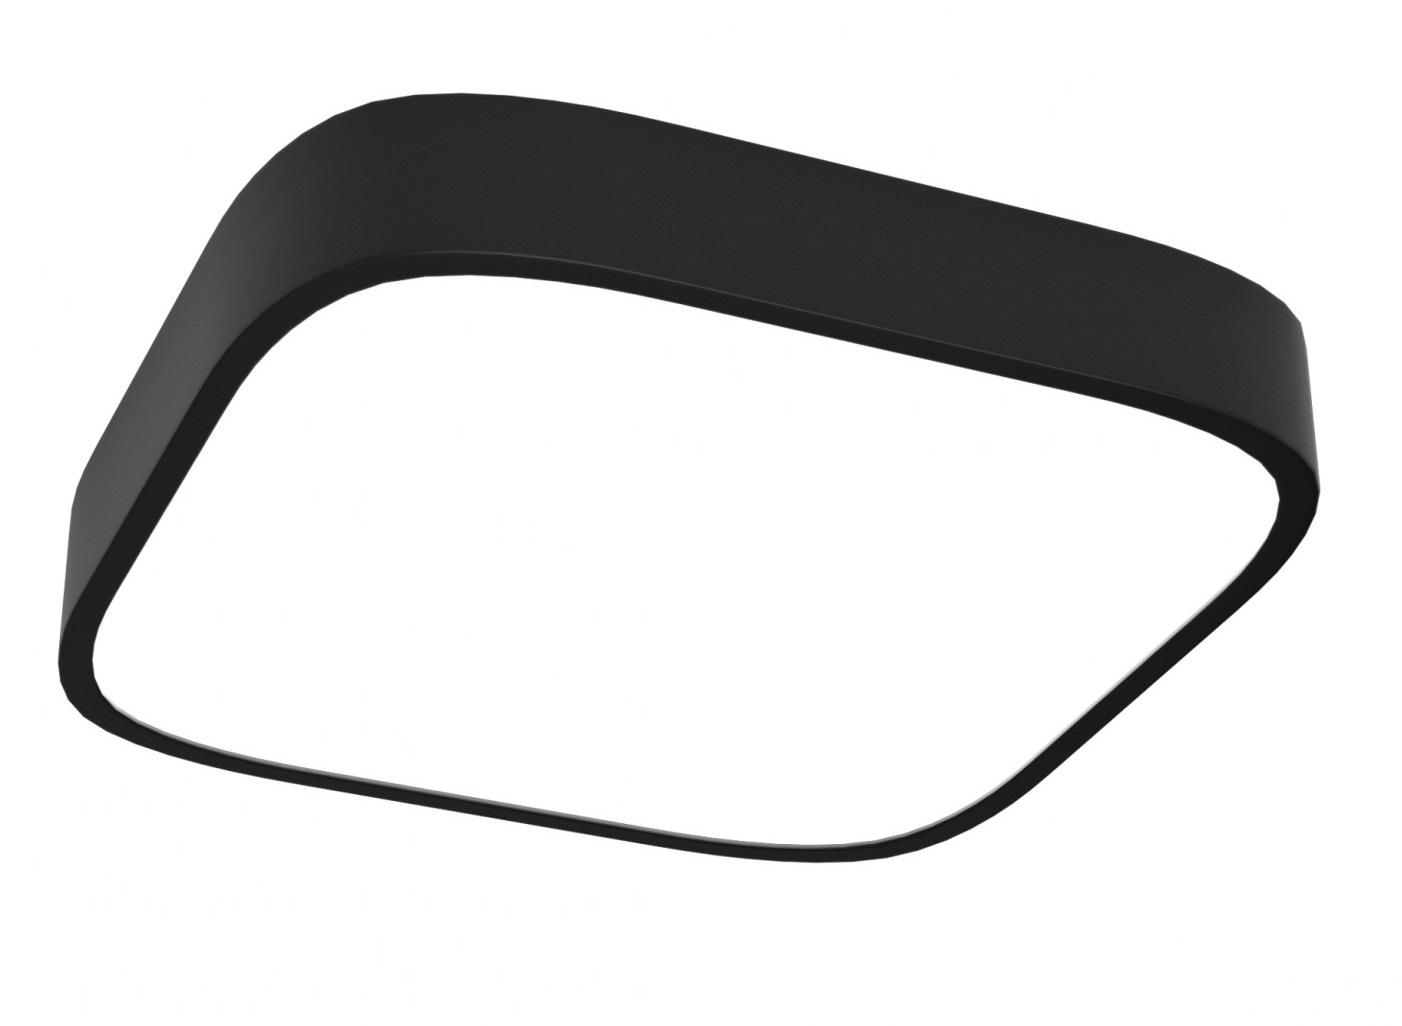 Immax Čierne SMART stropné svietidlo hranaté 36W 45cm 2